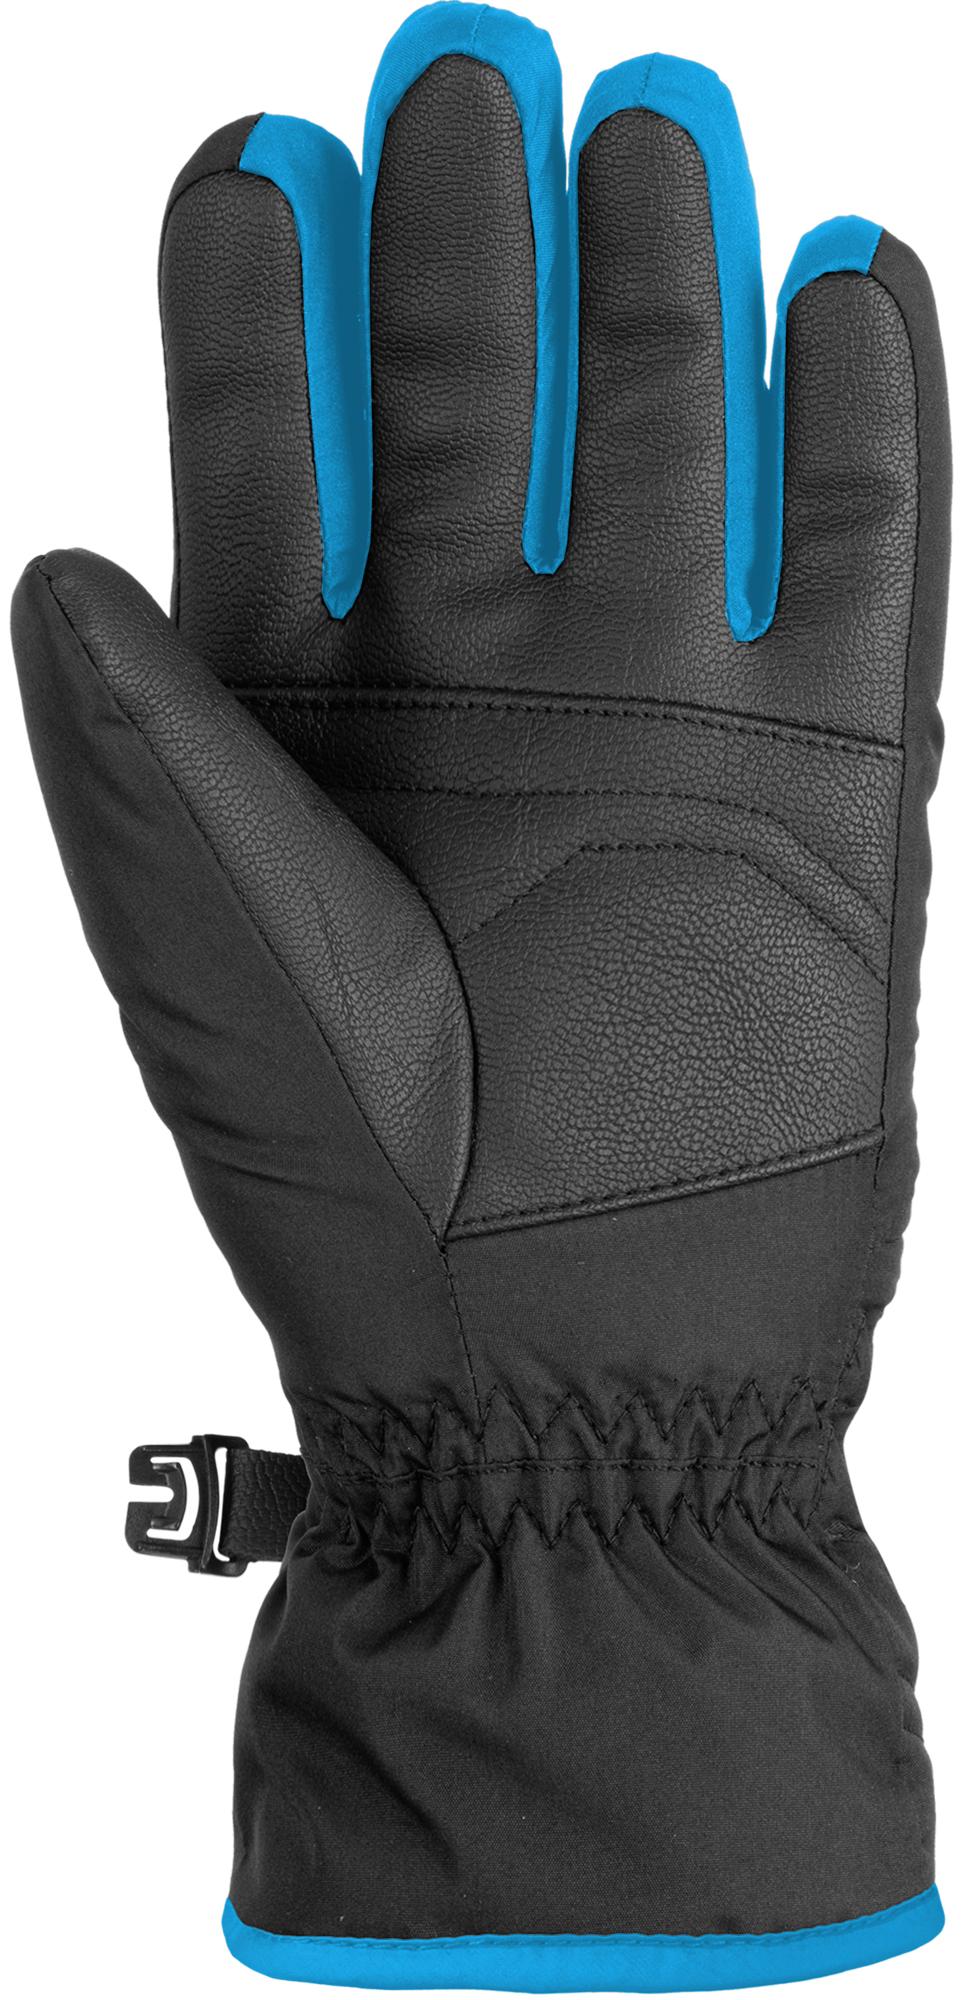 Level Race MittenWhite Blue or BlackSki Race Protection3024UM